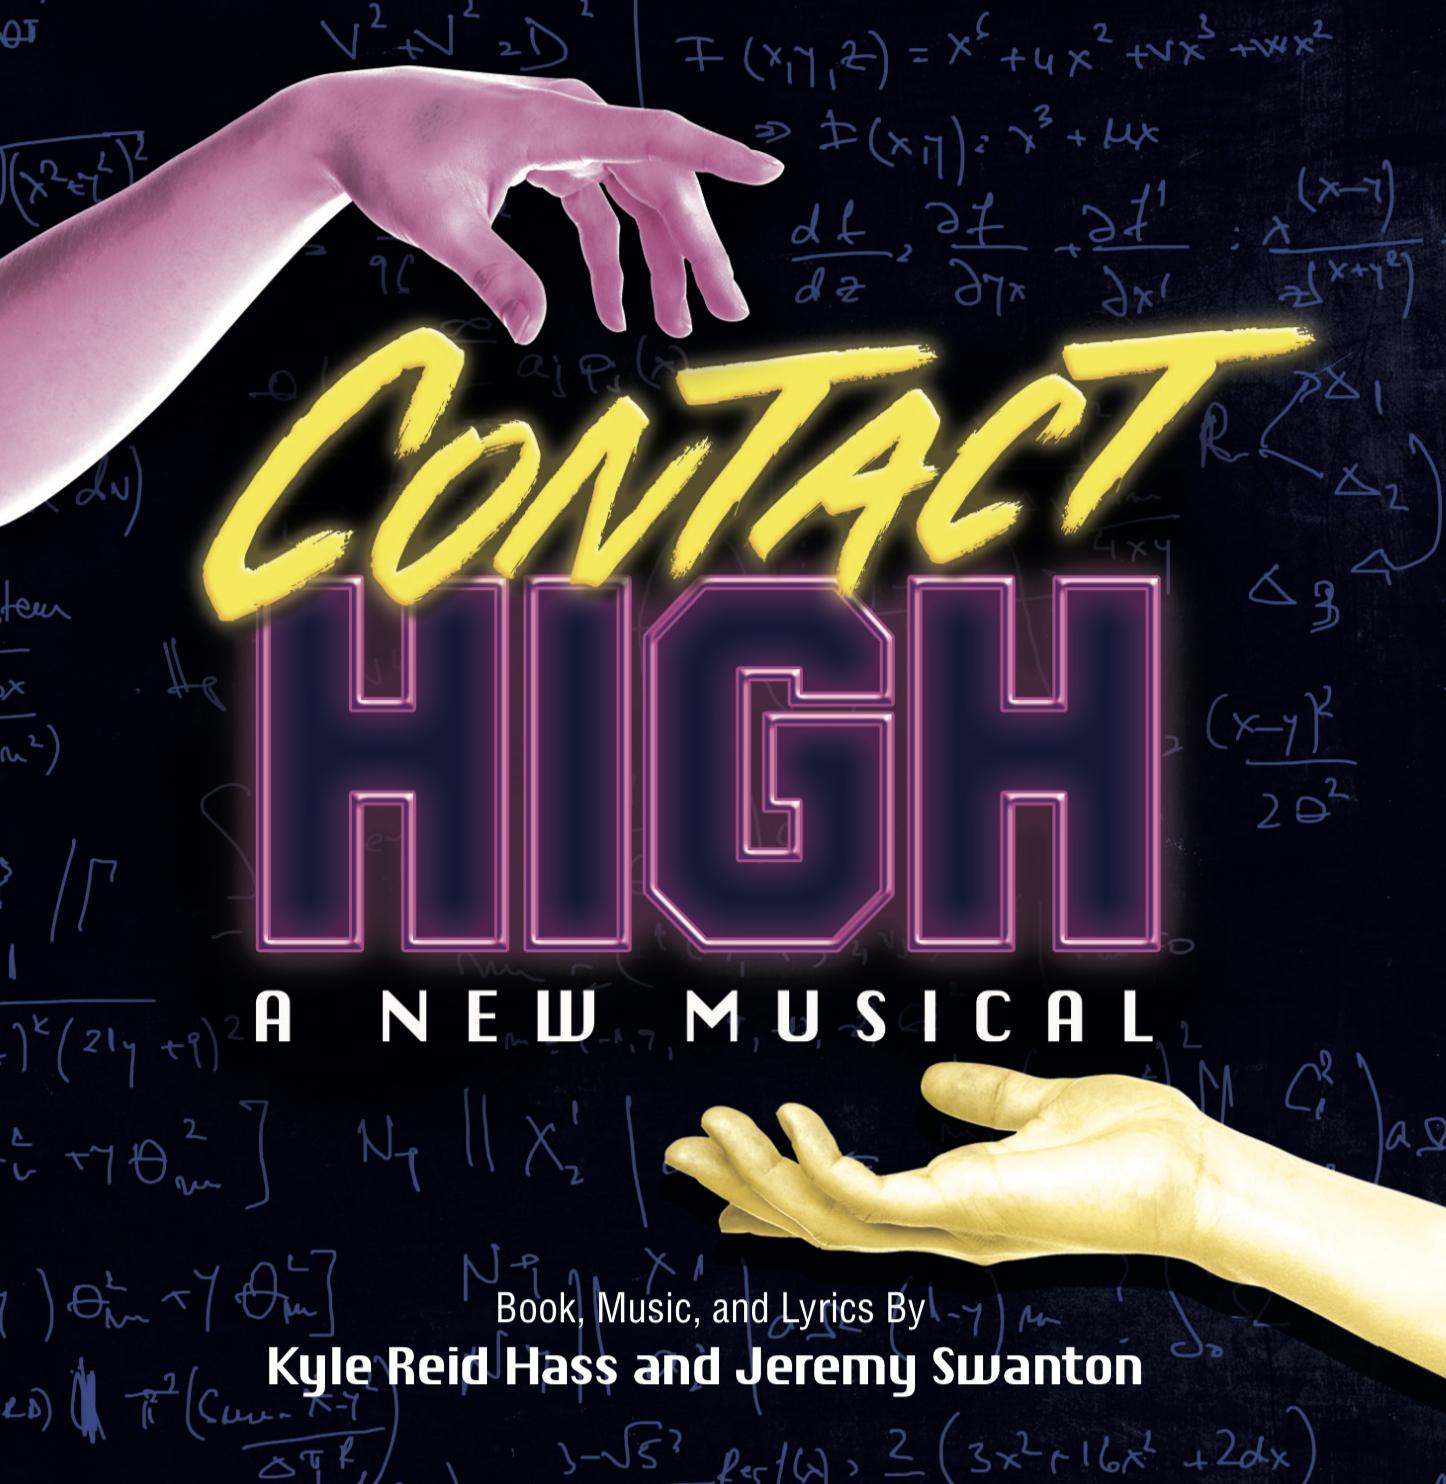 Contact High: The Studio Cast Recording